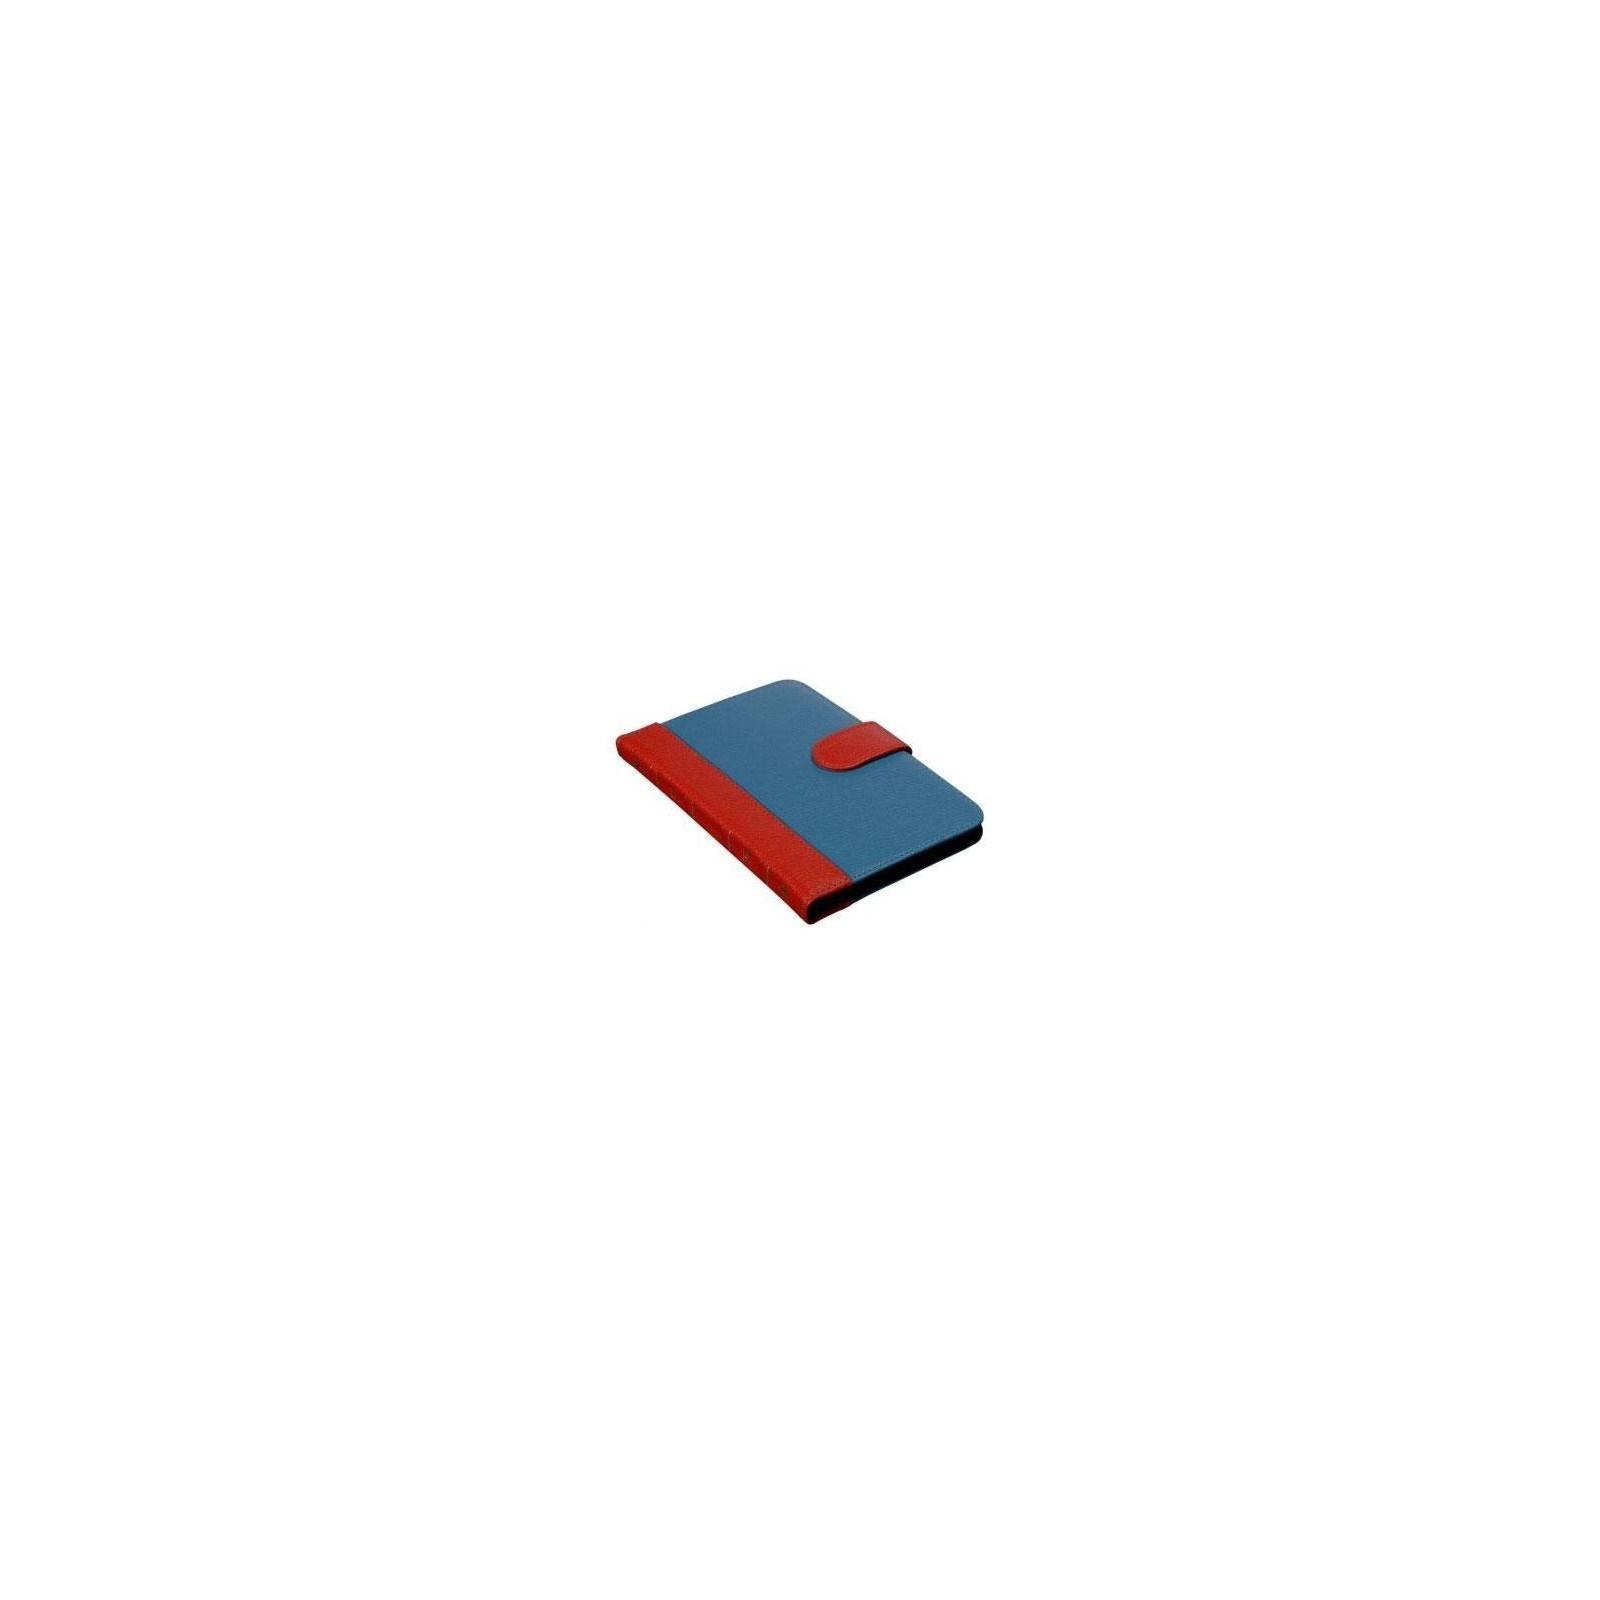 Чехол для электронной книги SB Bookcase L Blue/Red (SB141091)